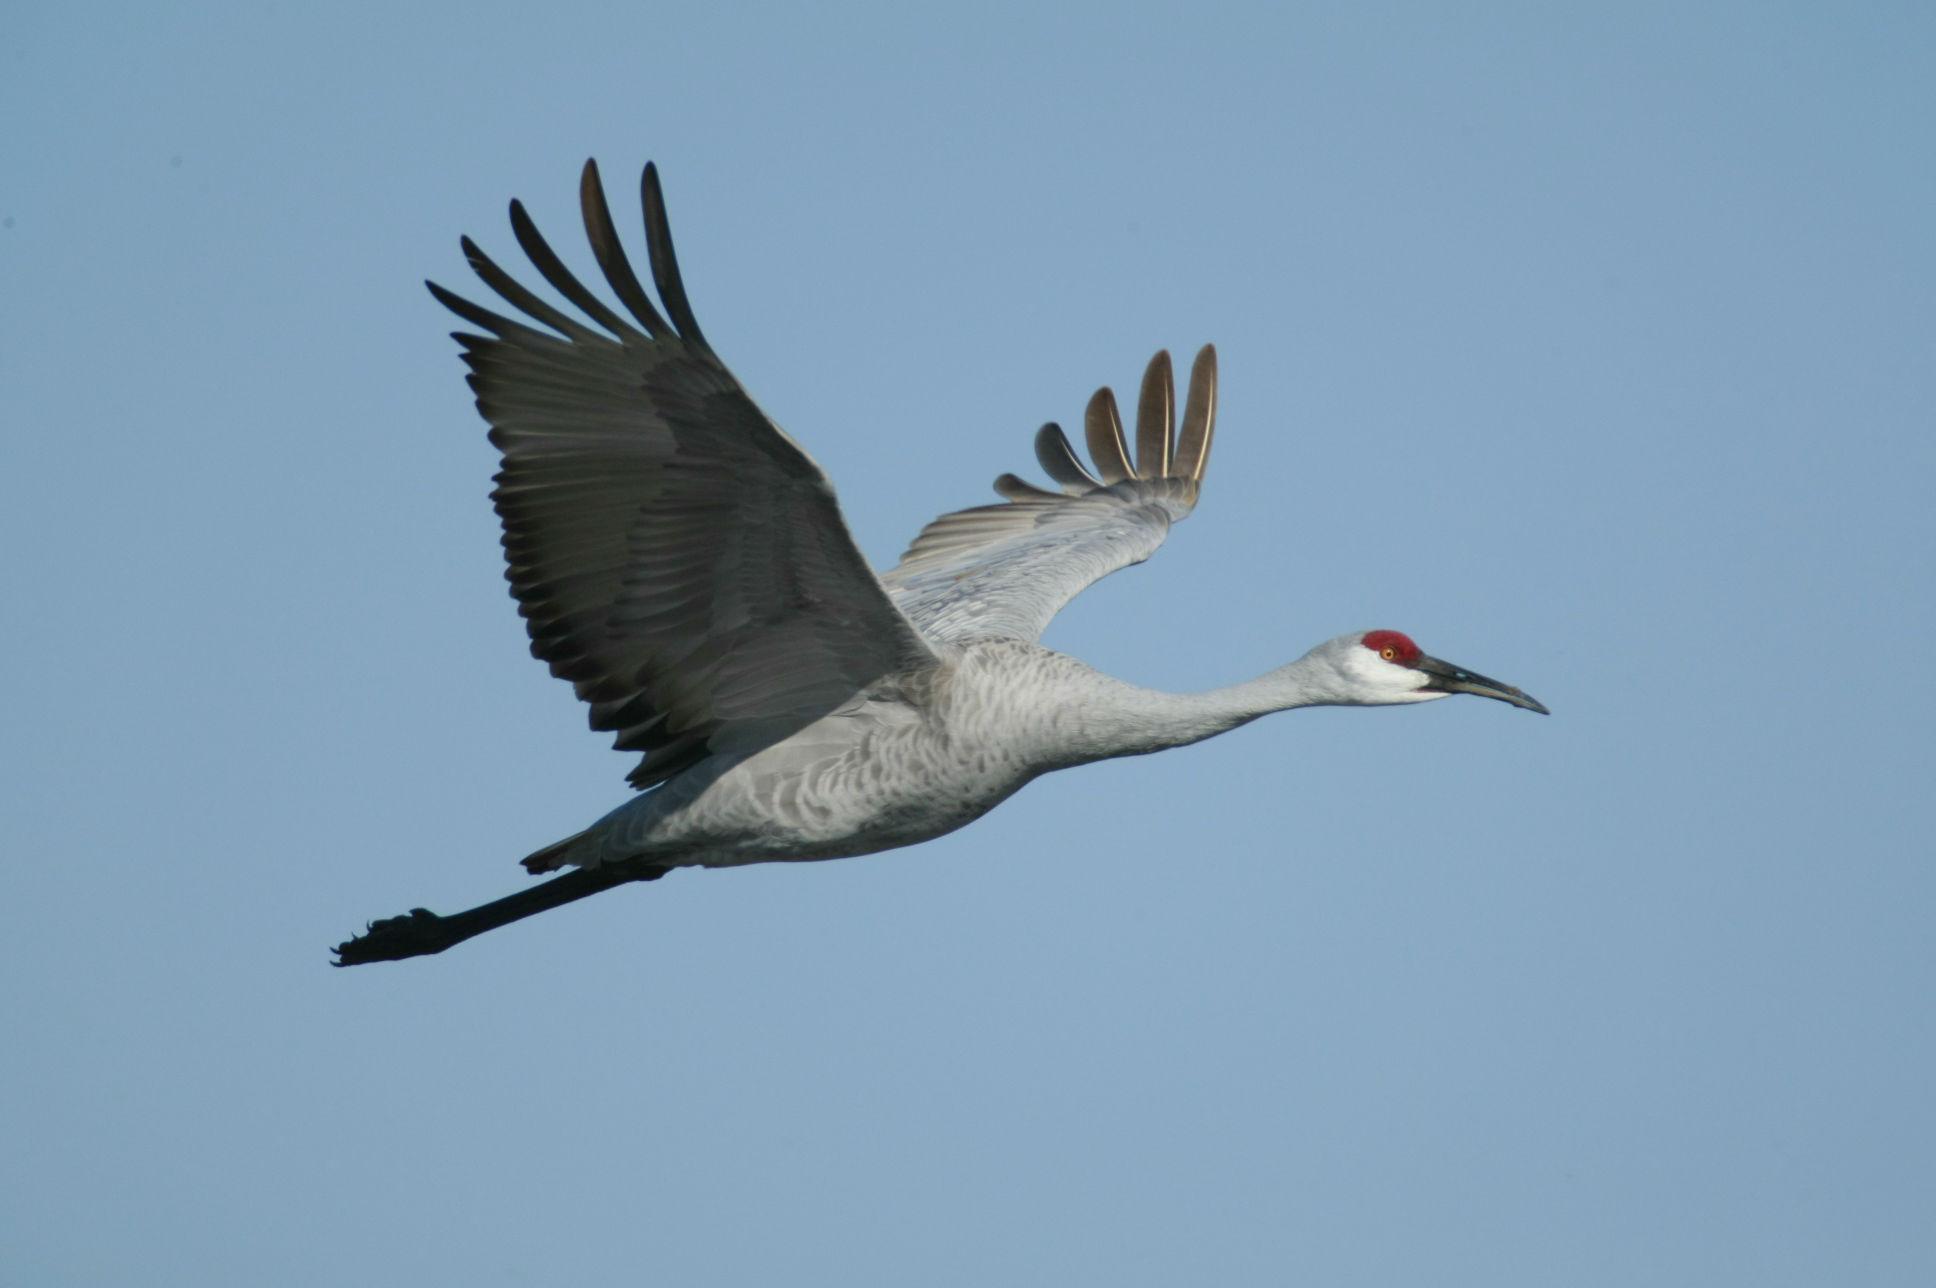 TPWD: Texas Whooper Watch: Whooping Crane Look-alikes